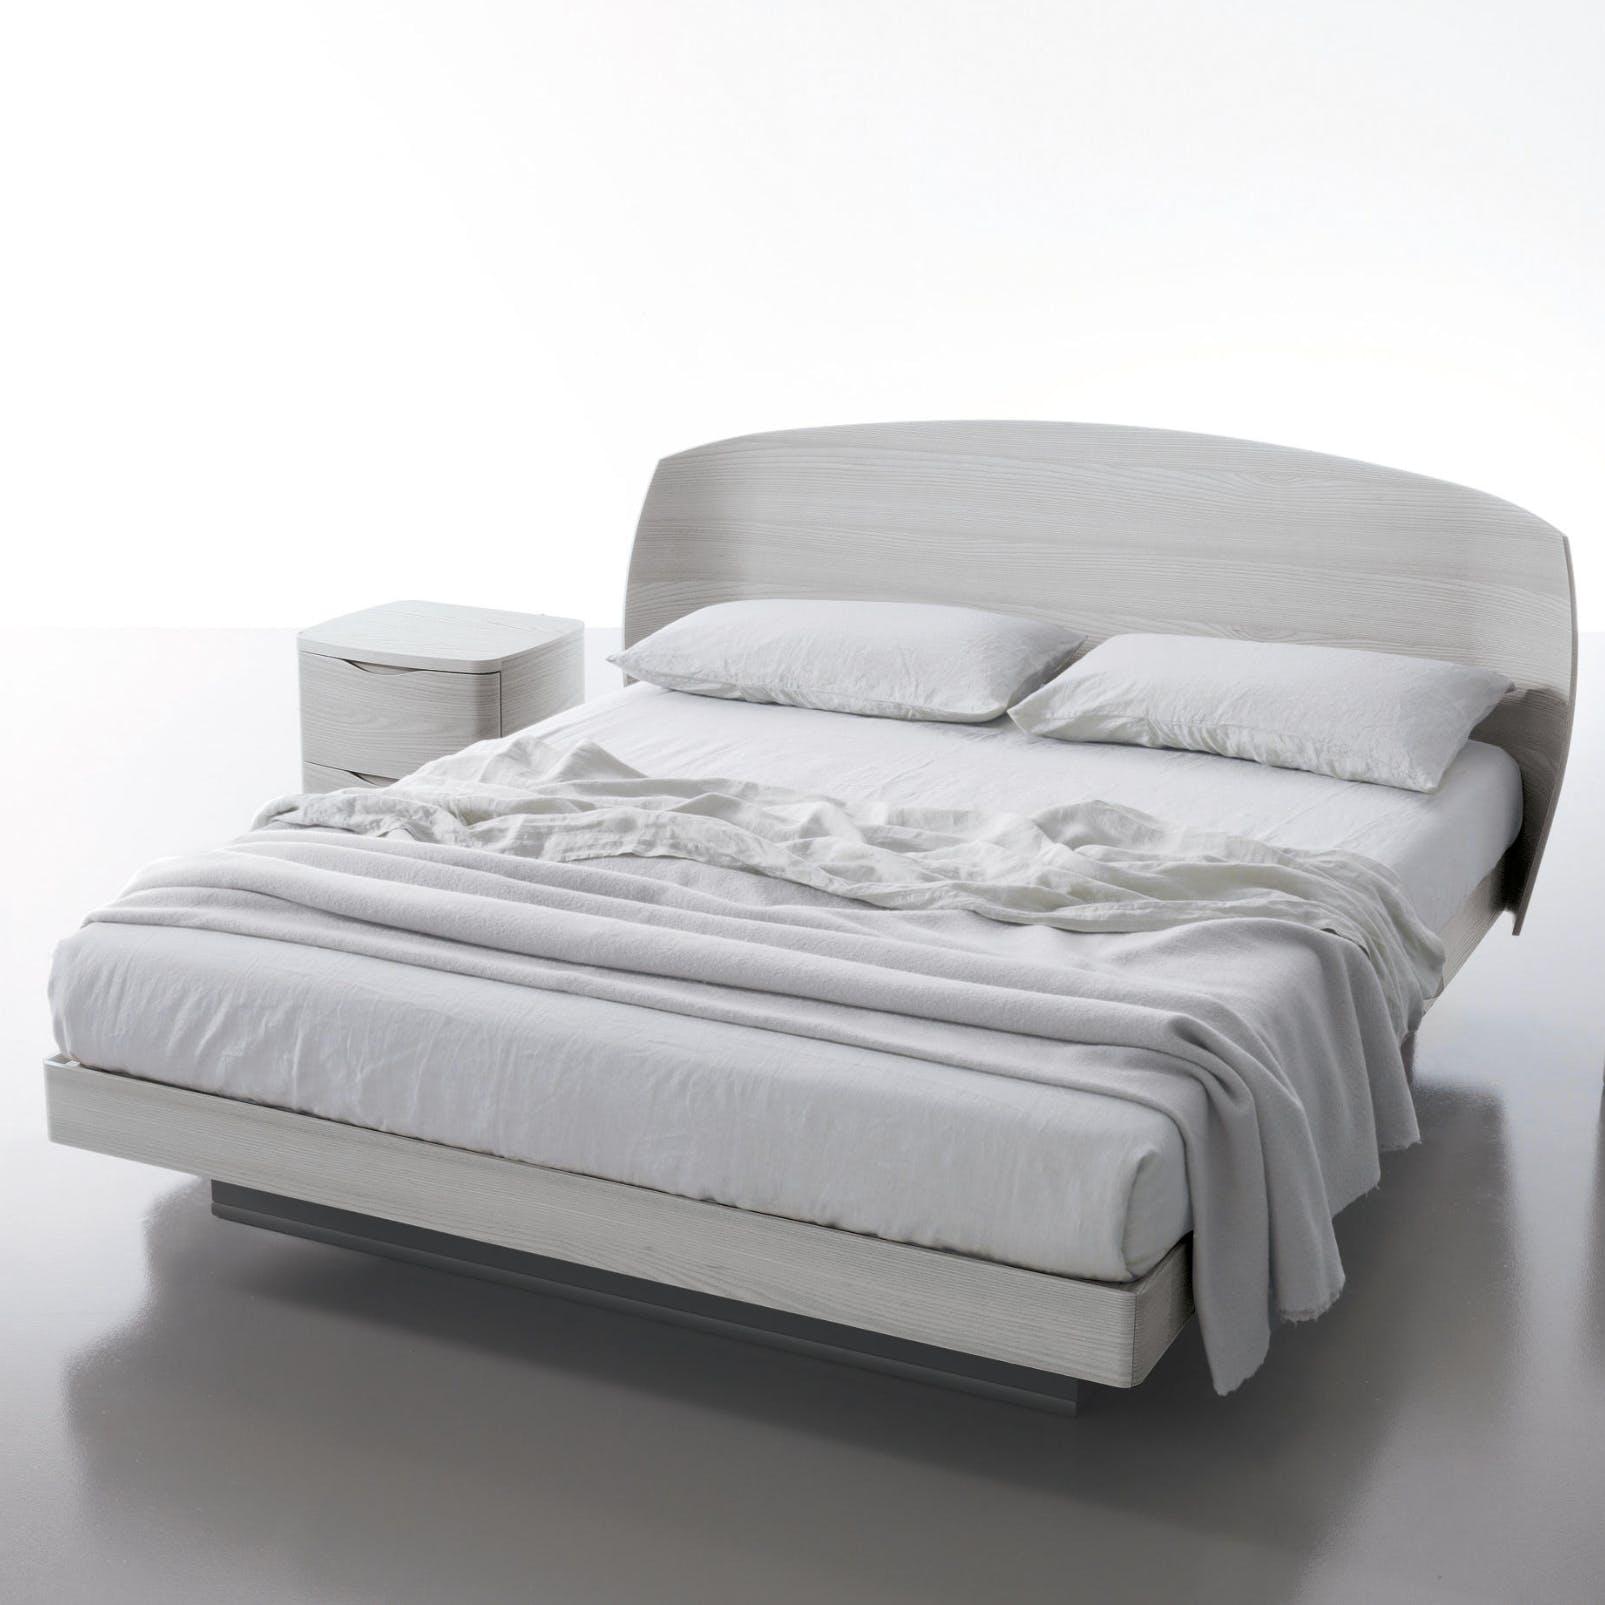 Caccaro Coccolo Bed Angle Haute Living